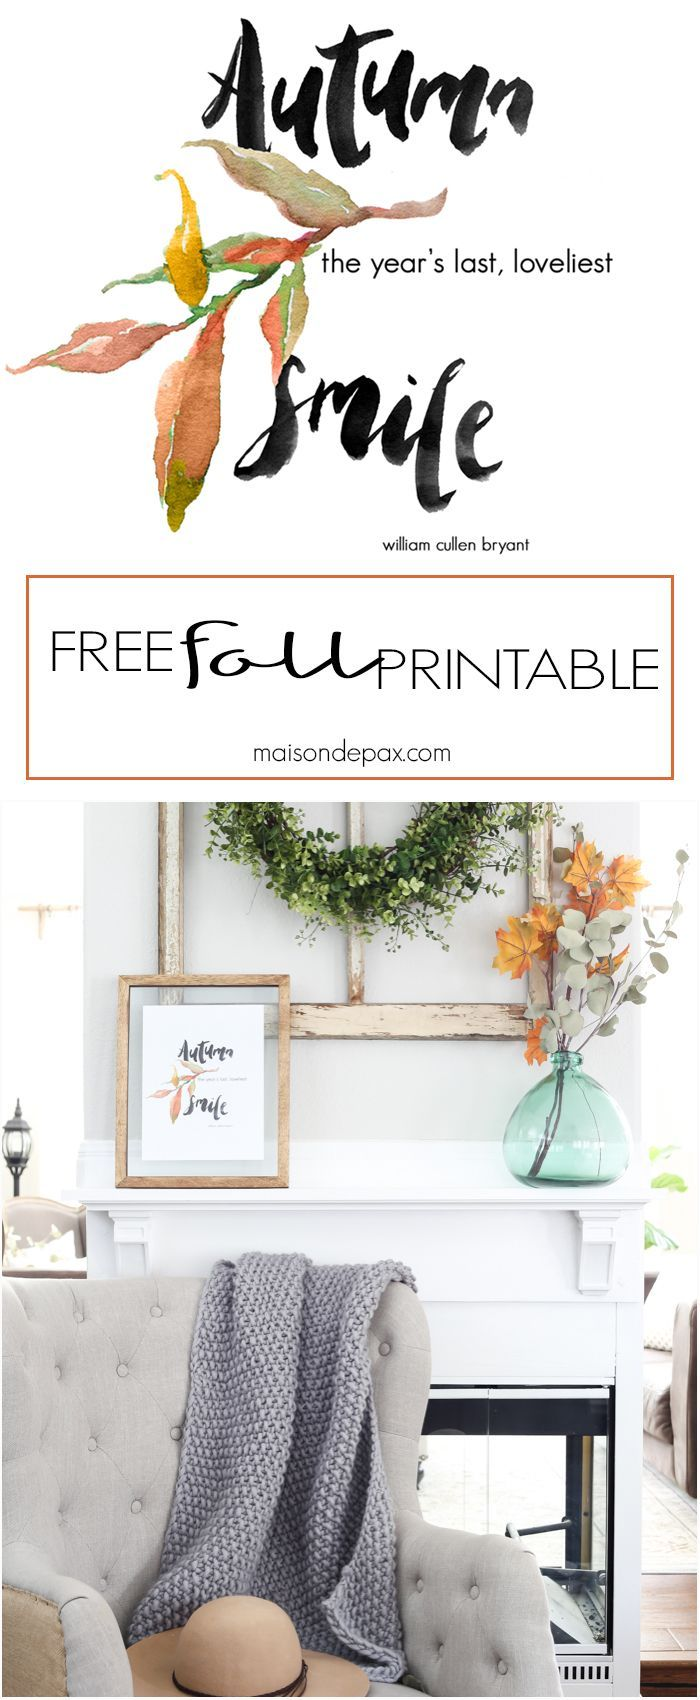 Printable Room Decor 254 Best Free Printables Images On Pinterest Free Printables